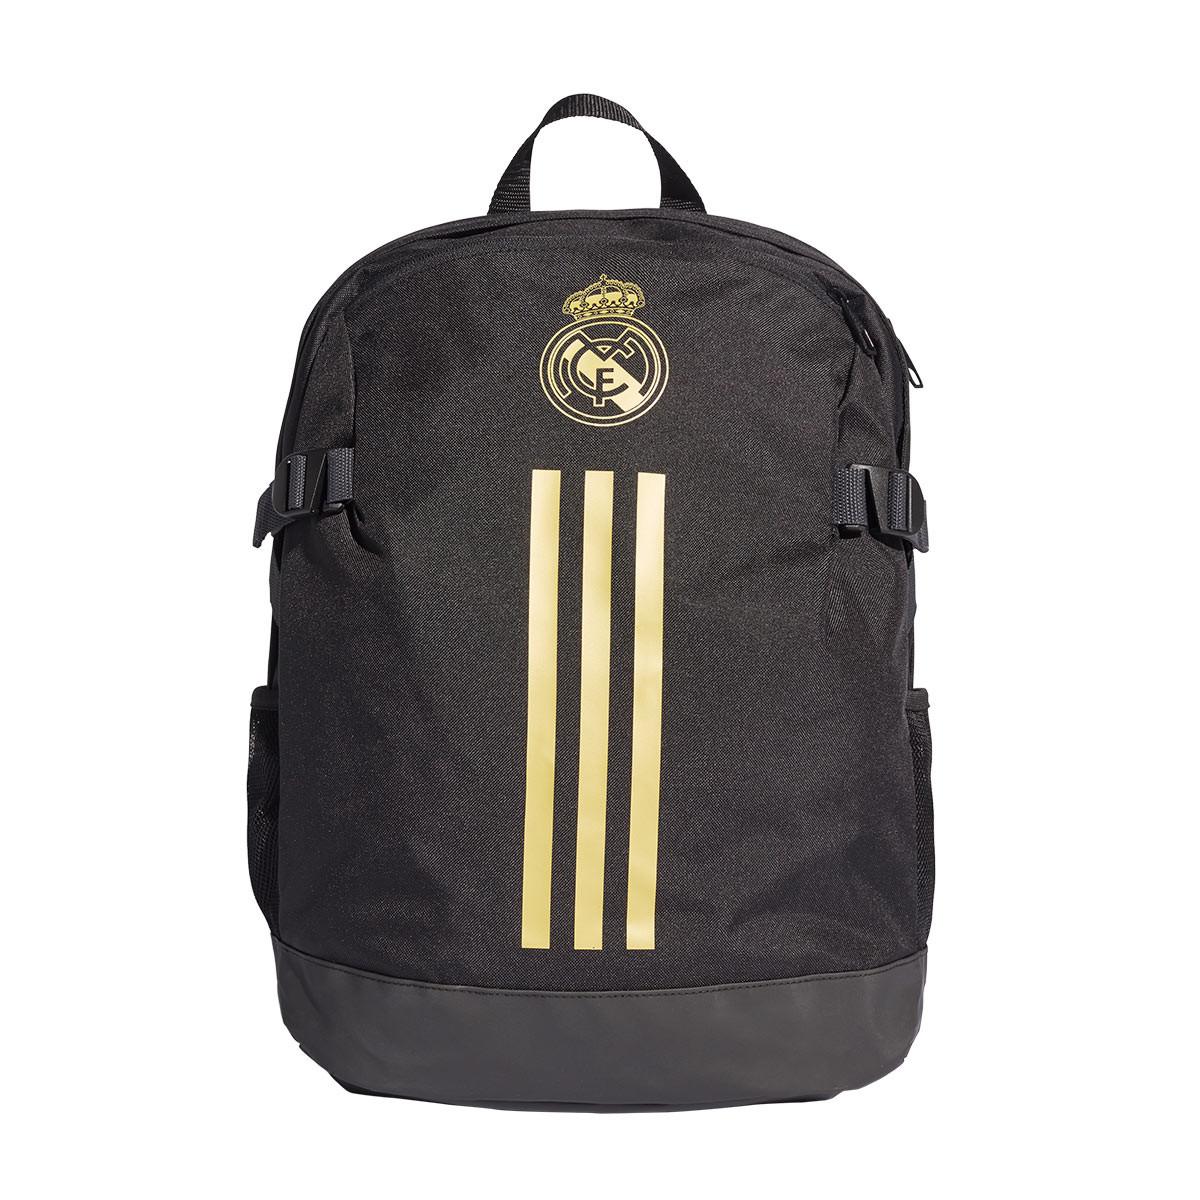 Mochila adidas Real Madrid BP 2019 2020